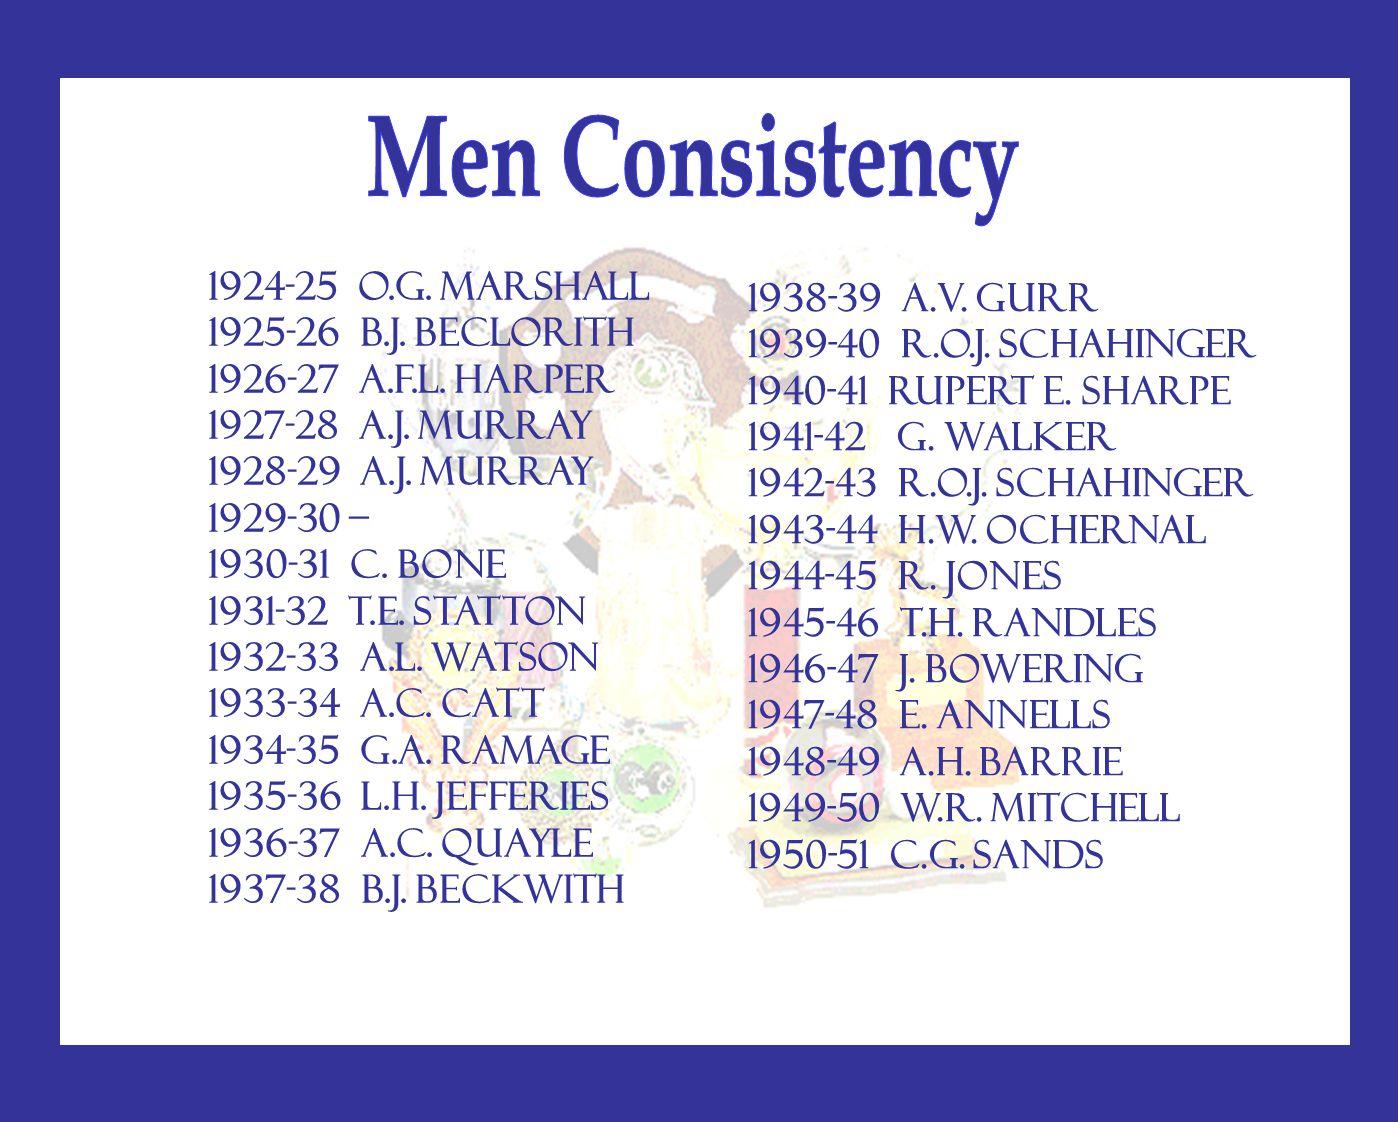 1924-25 O.G. MARSHALL 1925-26 B.J. BECLORITH 1926-27 A.F.L. HARPER 1927-28 A.J. MURRAY 1928-29 A.J. MURRAY 1929-30 – 1930-31 C. BONE 1931-32 T.E. STAT